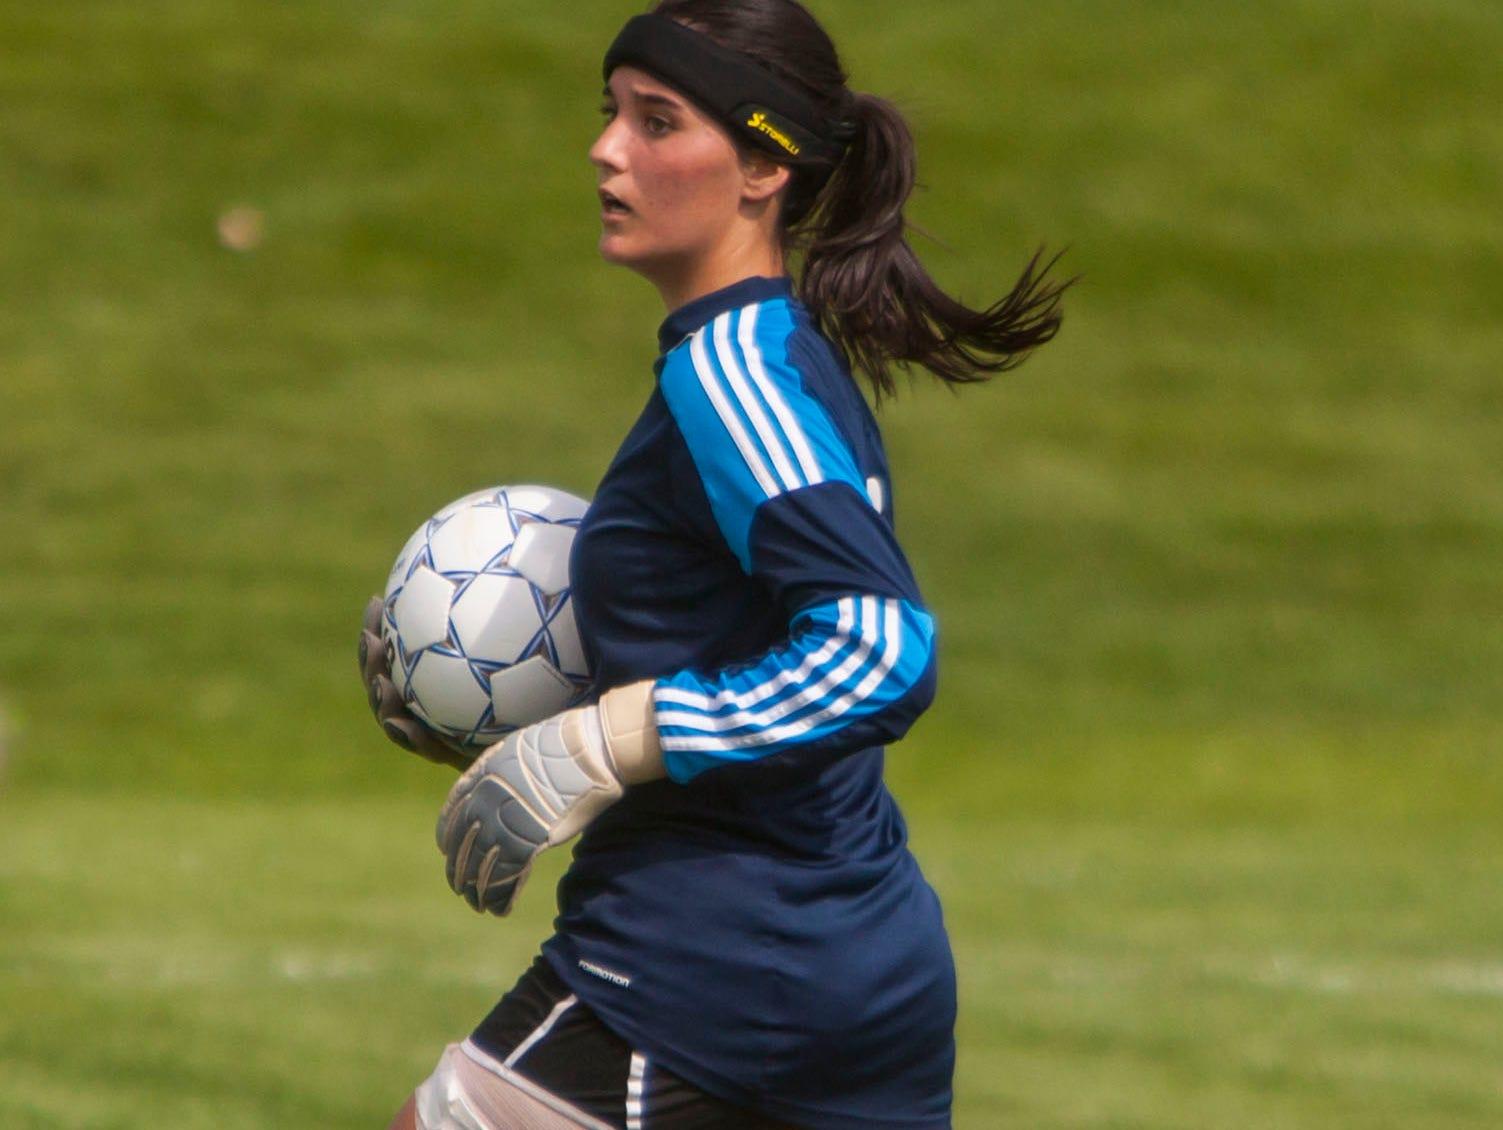 High School Girls Soccer: Cedar at Canyon View, Tuesday, Aug. 23, 2016.